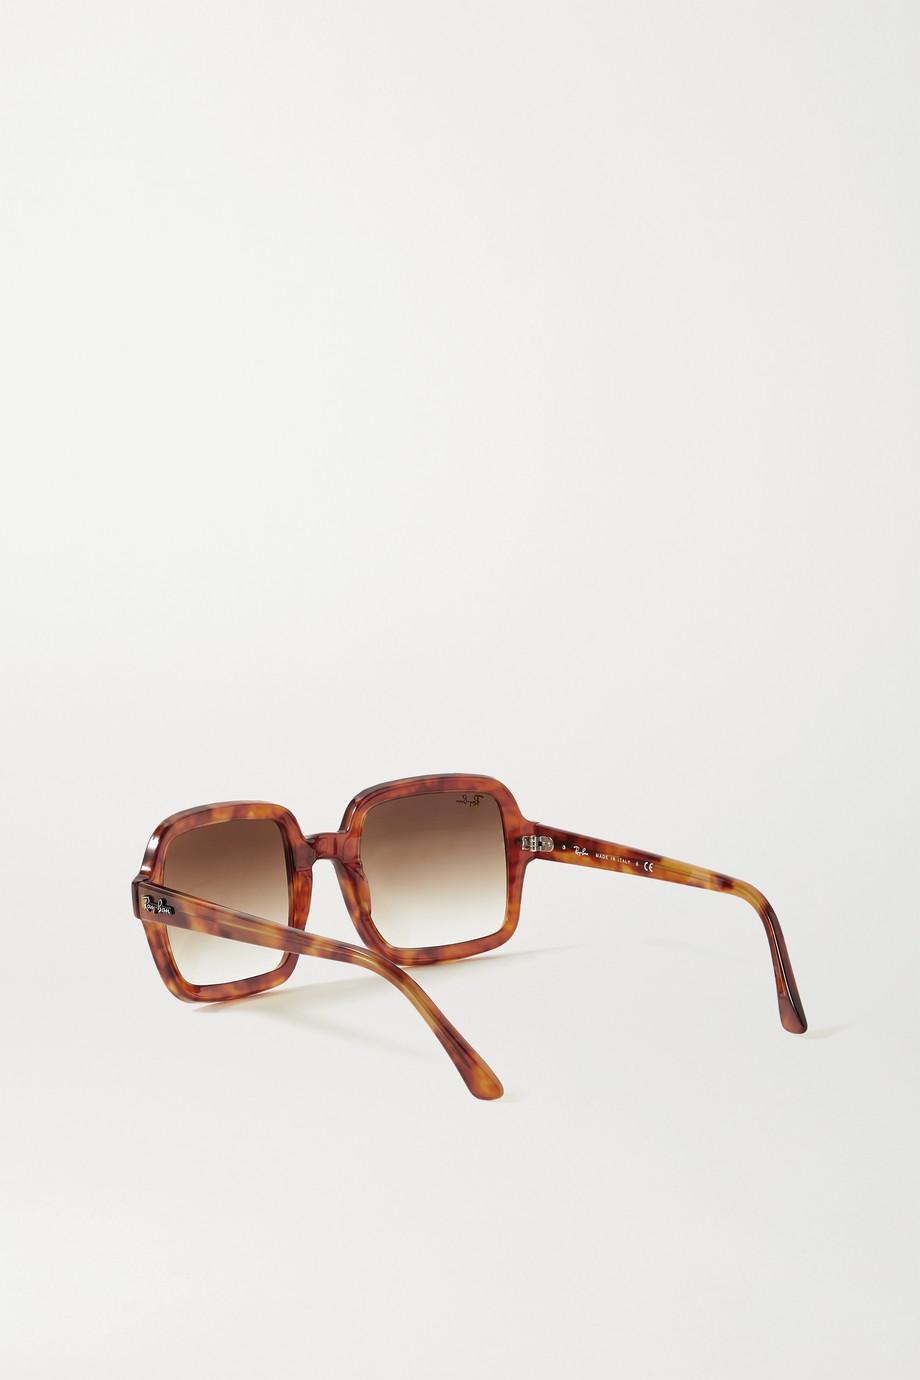 Ray-Ban Square-frame tortoiseshell acetate sunglasses